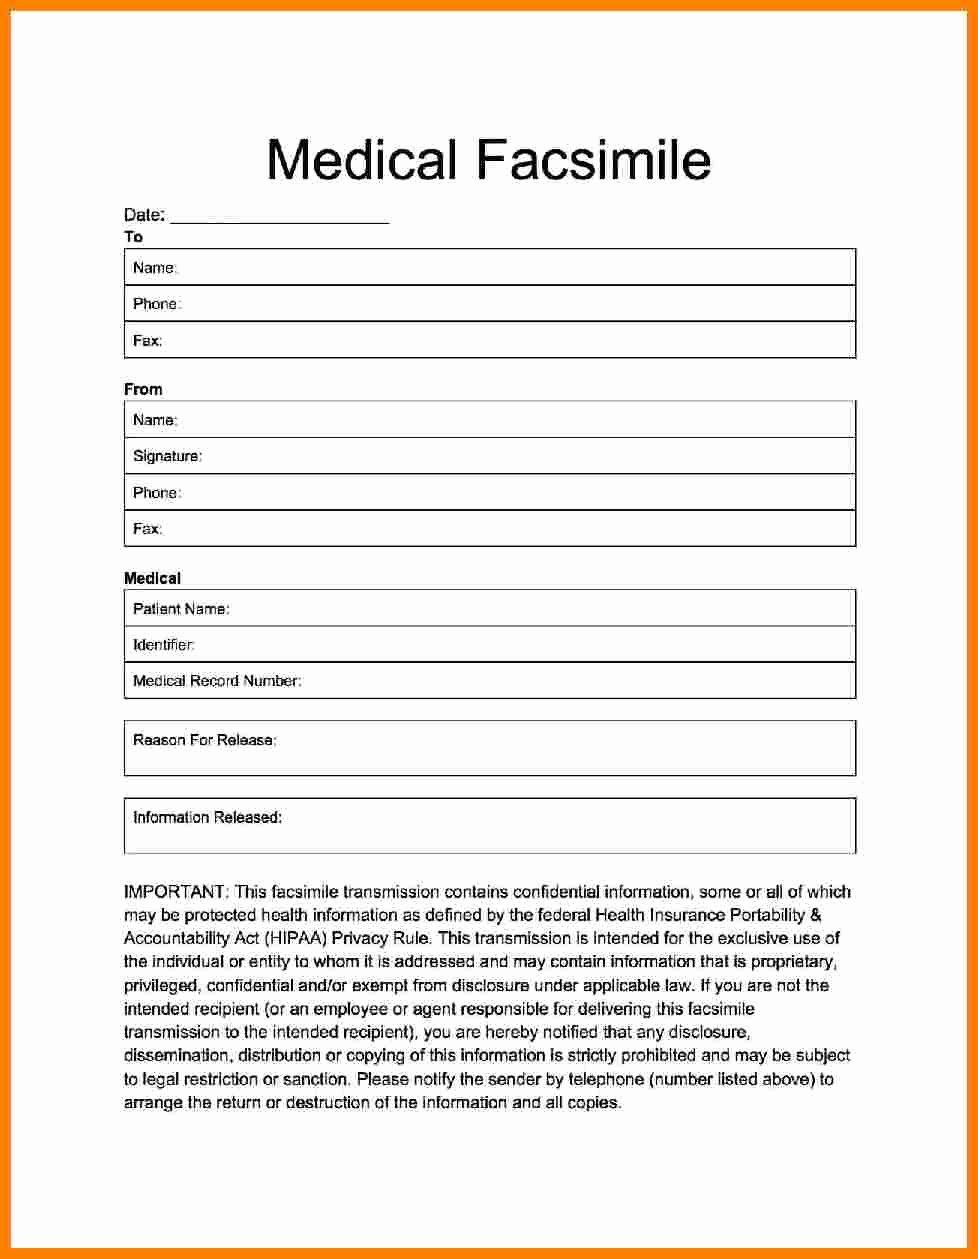 Fax Cover Sheet Disclaimer Elegant 5 Fax Cover Sheet Disclaimer